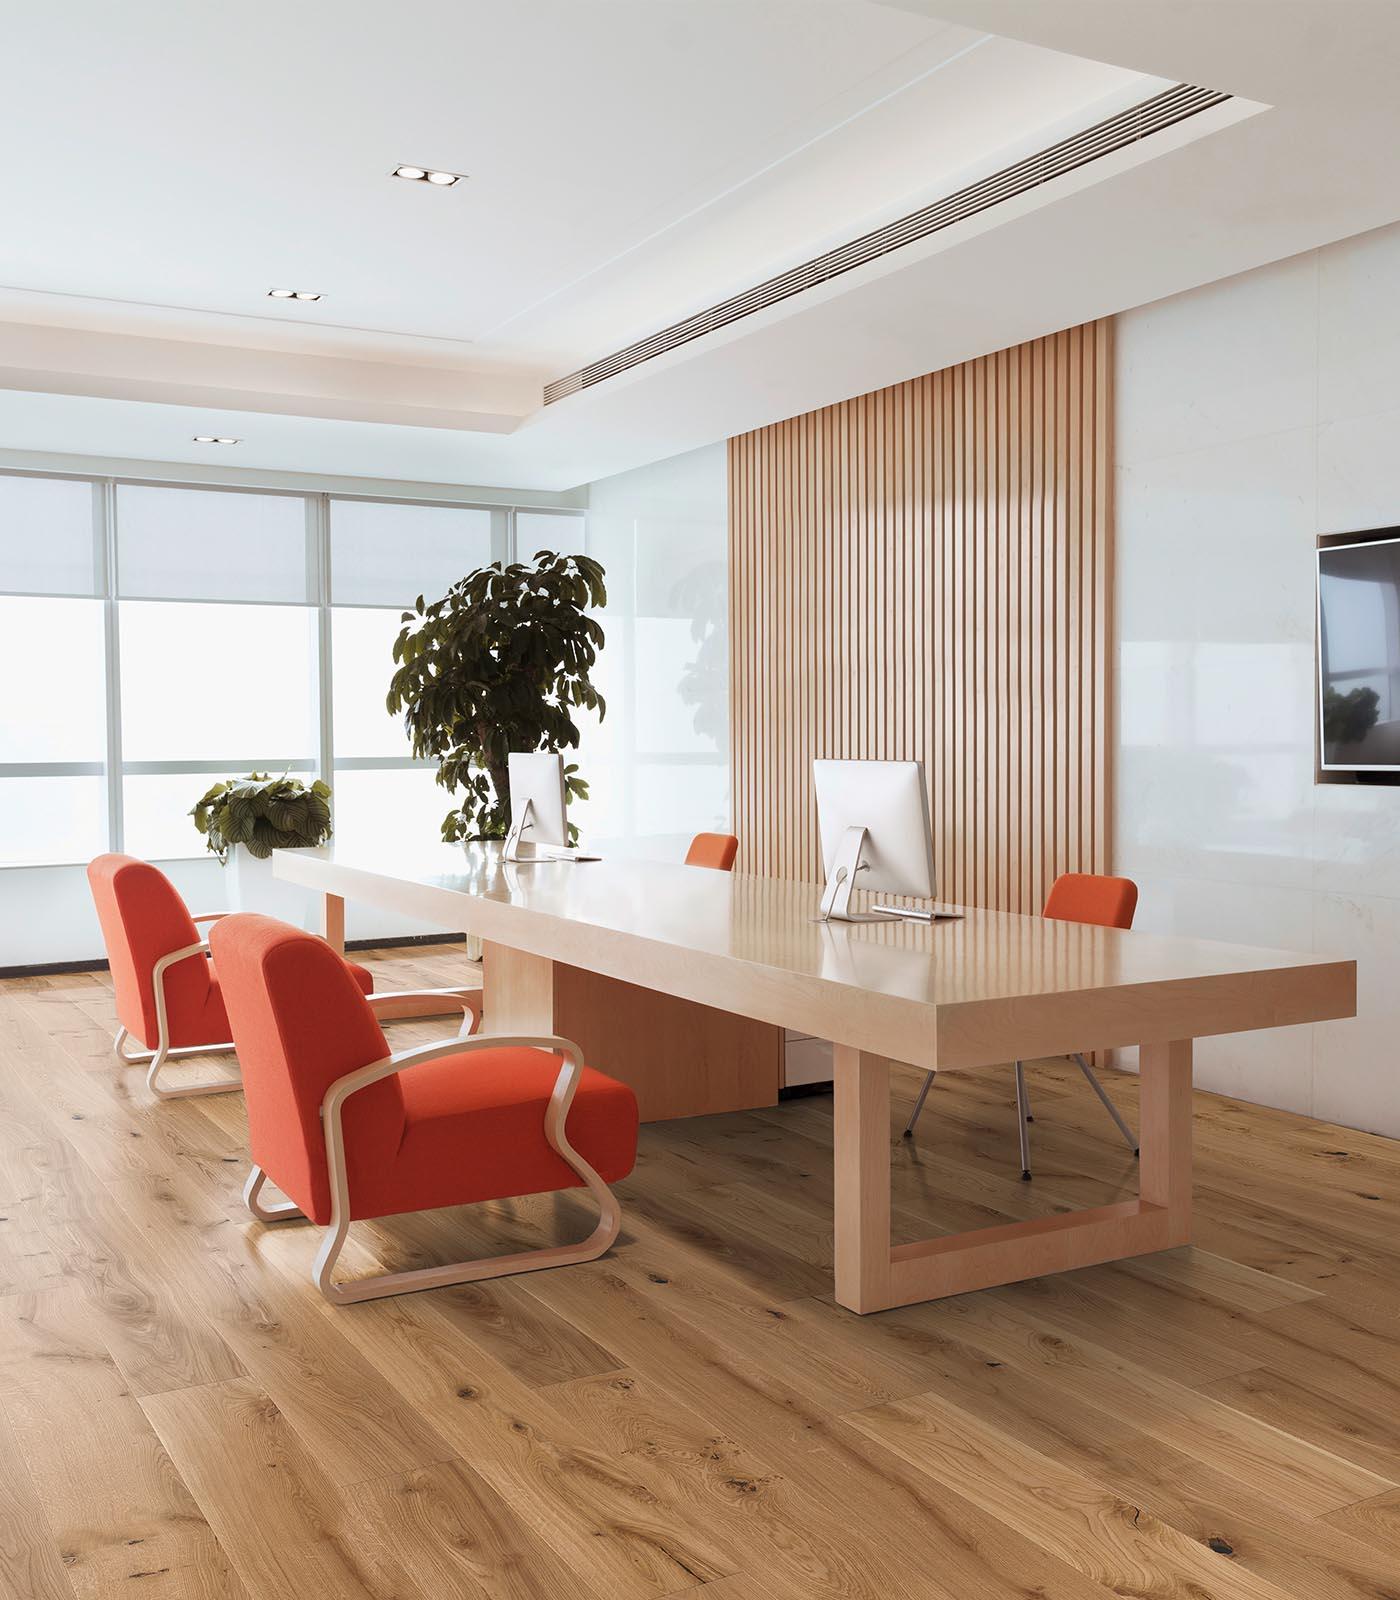 Lifestyle-European-Oak-grading-floors-room